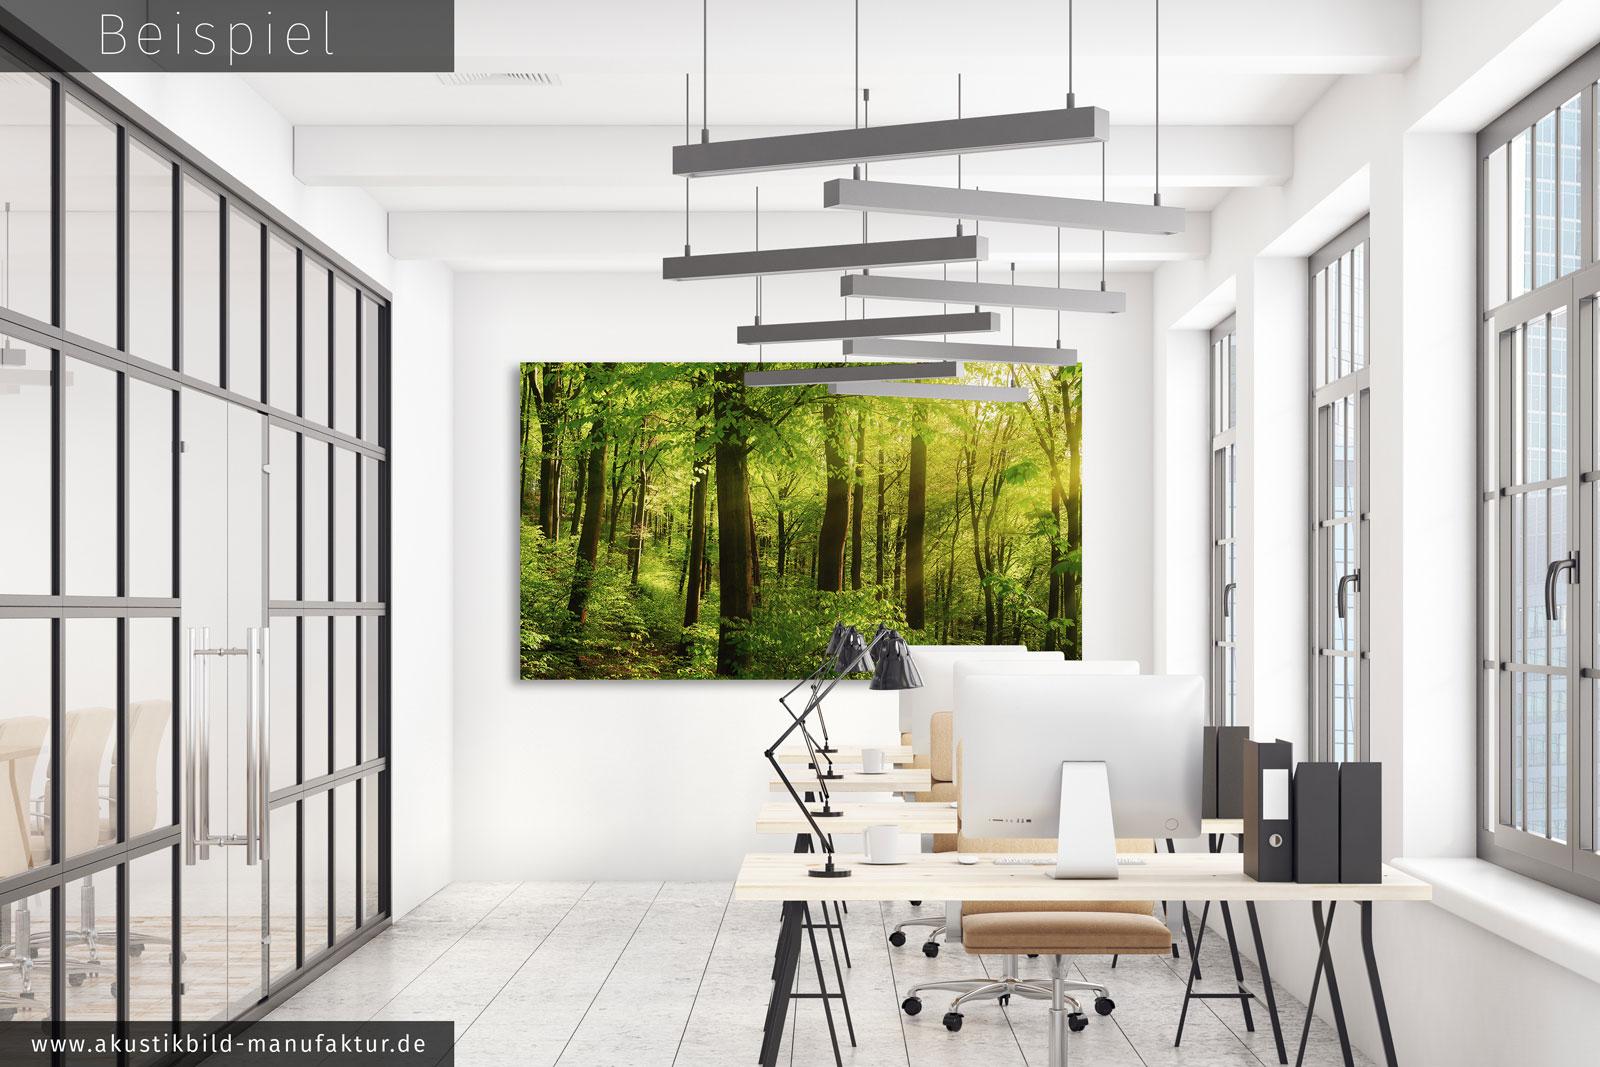 raumakustik verbessern buero wald natur gruen die akustikbild manufaktur. Black Bedroom Furniture Sets. Home Design Ideas